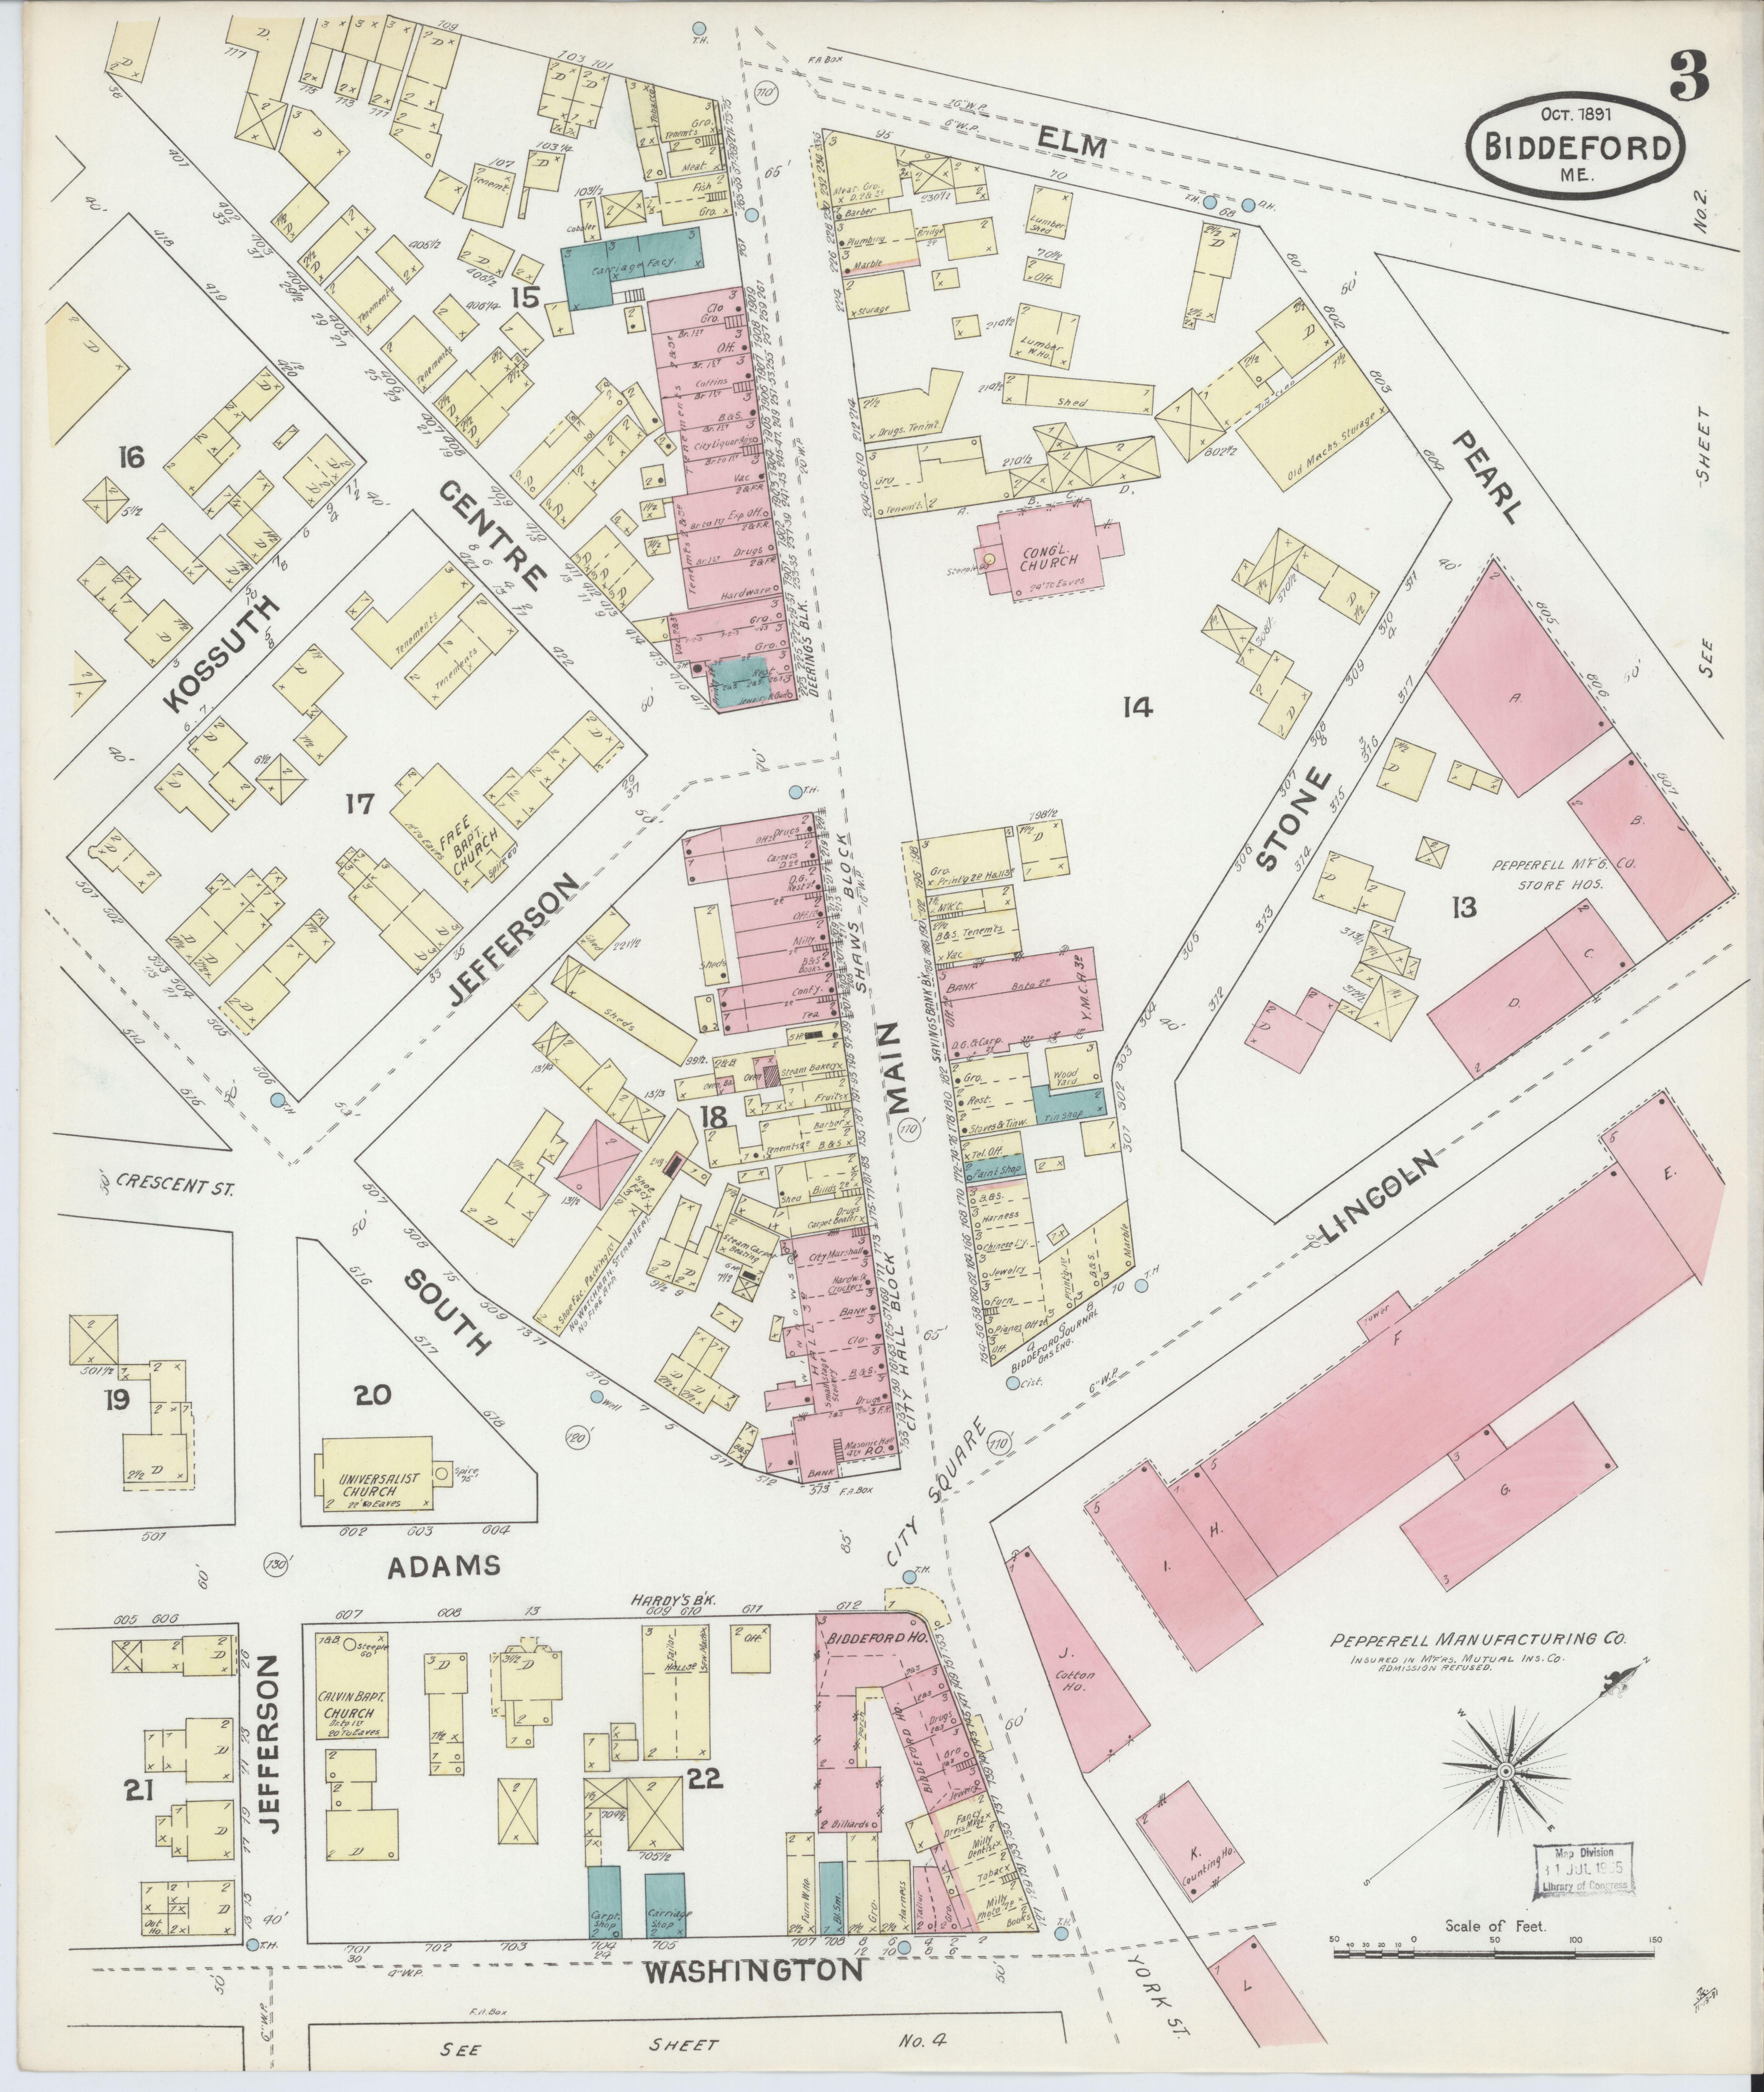 File Sanborn Fire Insurance Map From Biddeford York County Maine Loc Sanborn03433 002 3 Jpg Wikimedia Commons